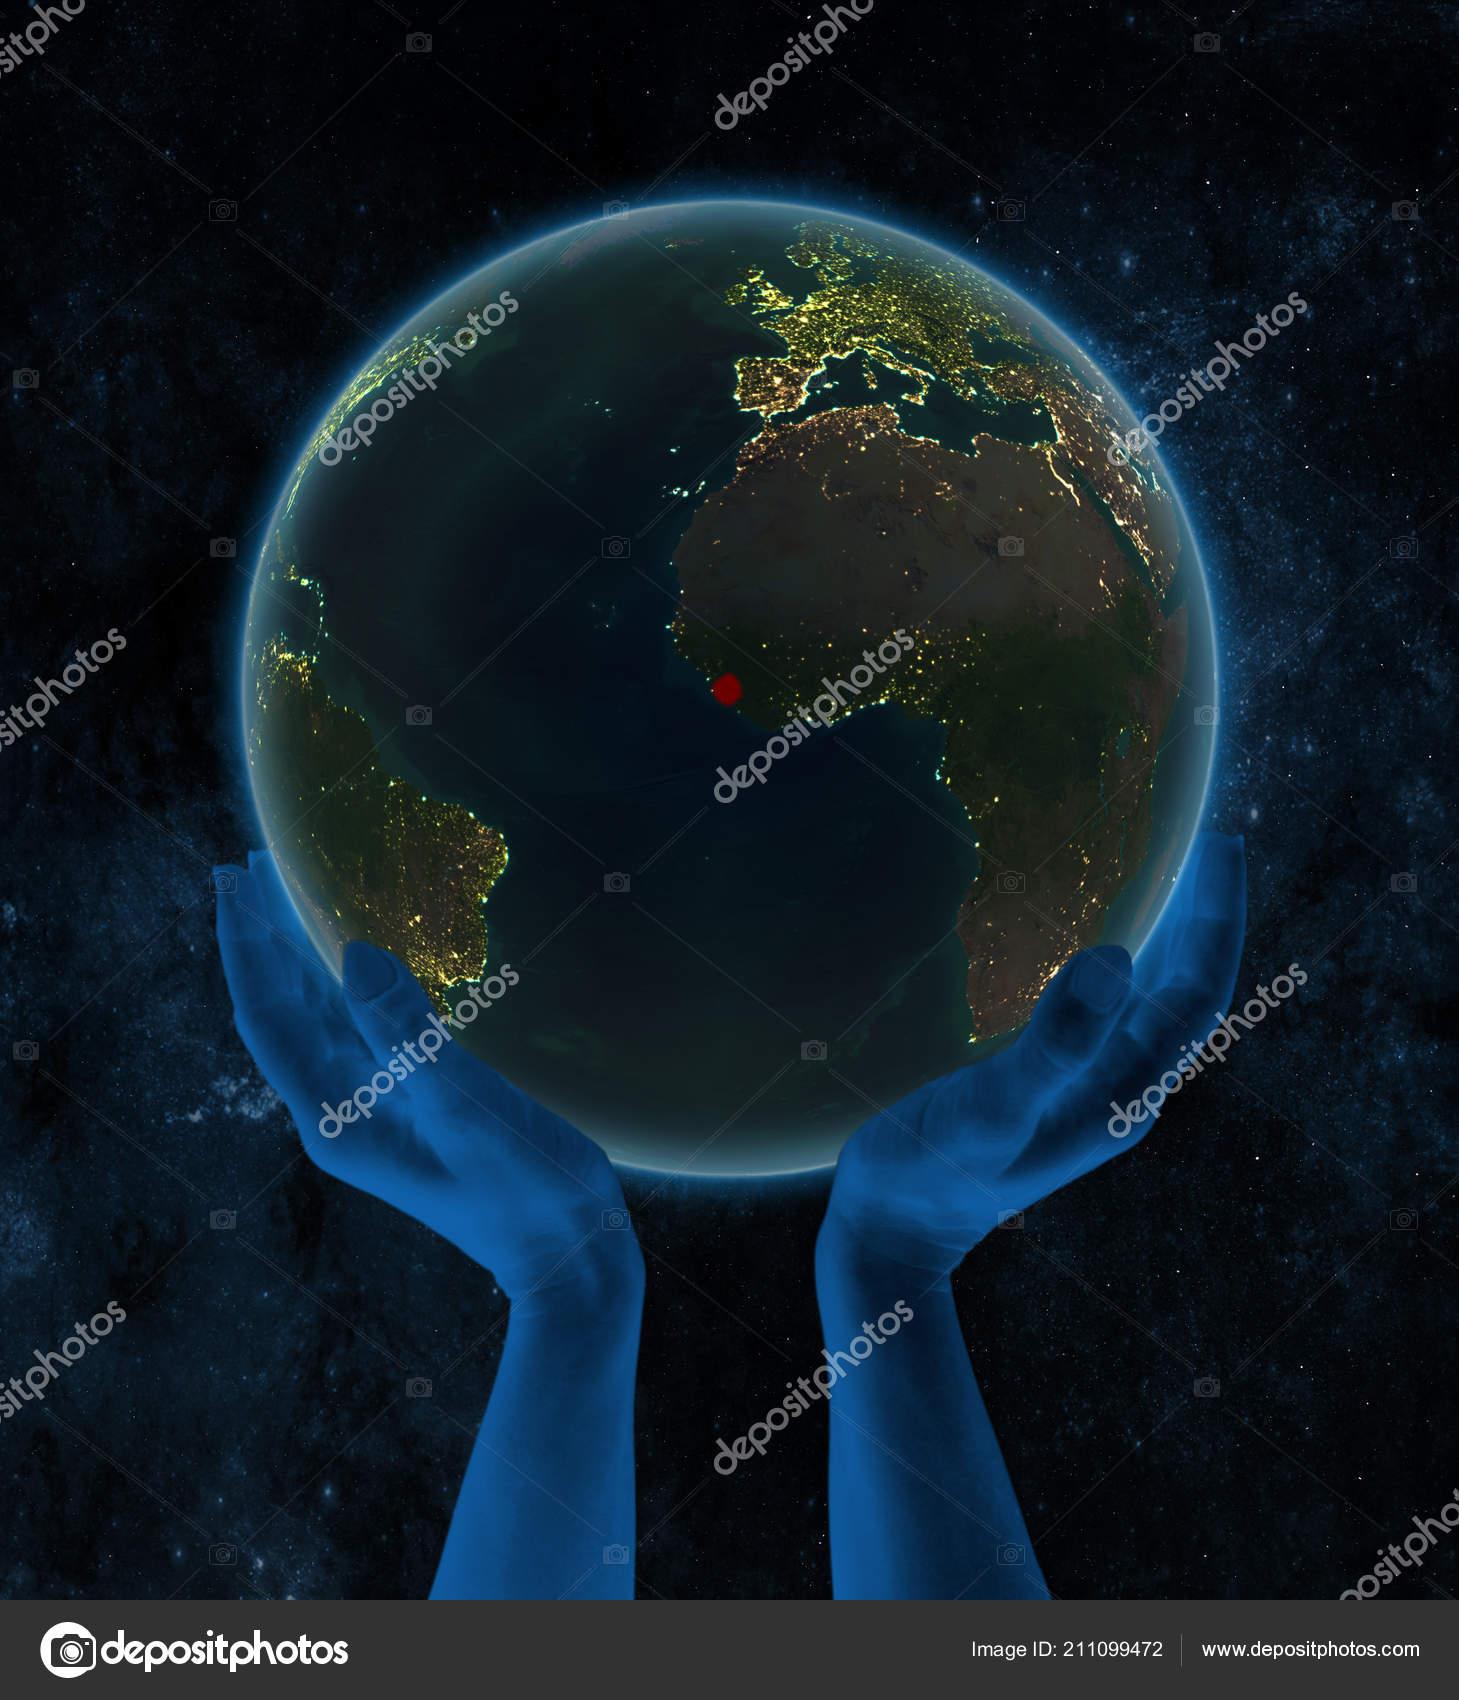 Sierra Leone Night Earth Hands Space Illustration — Stock